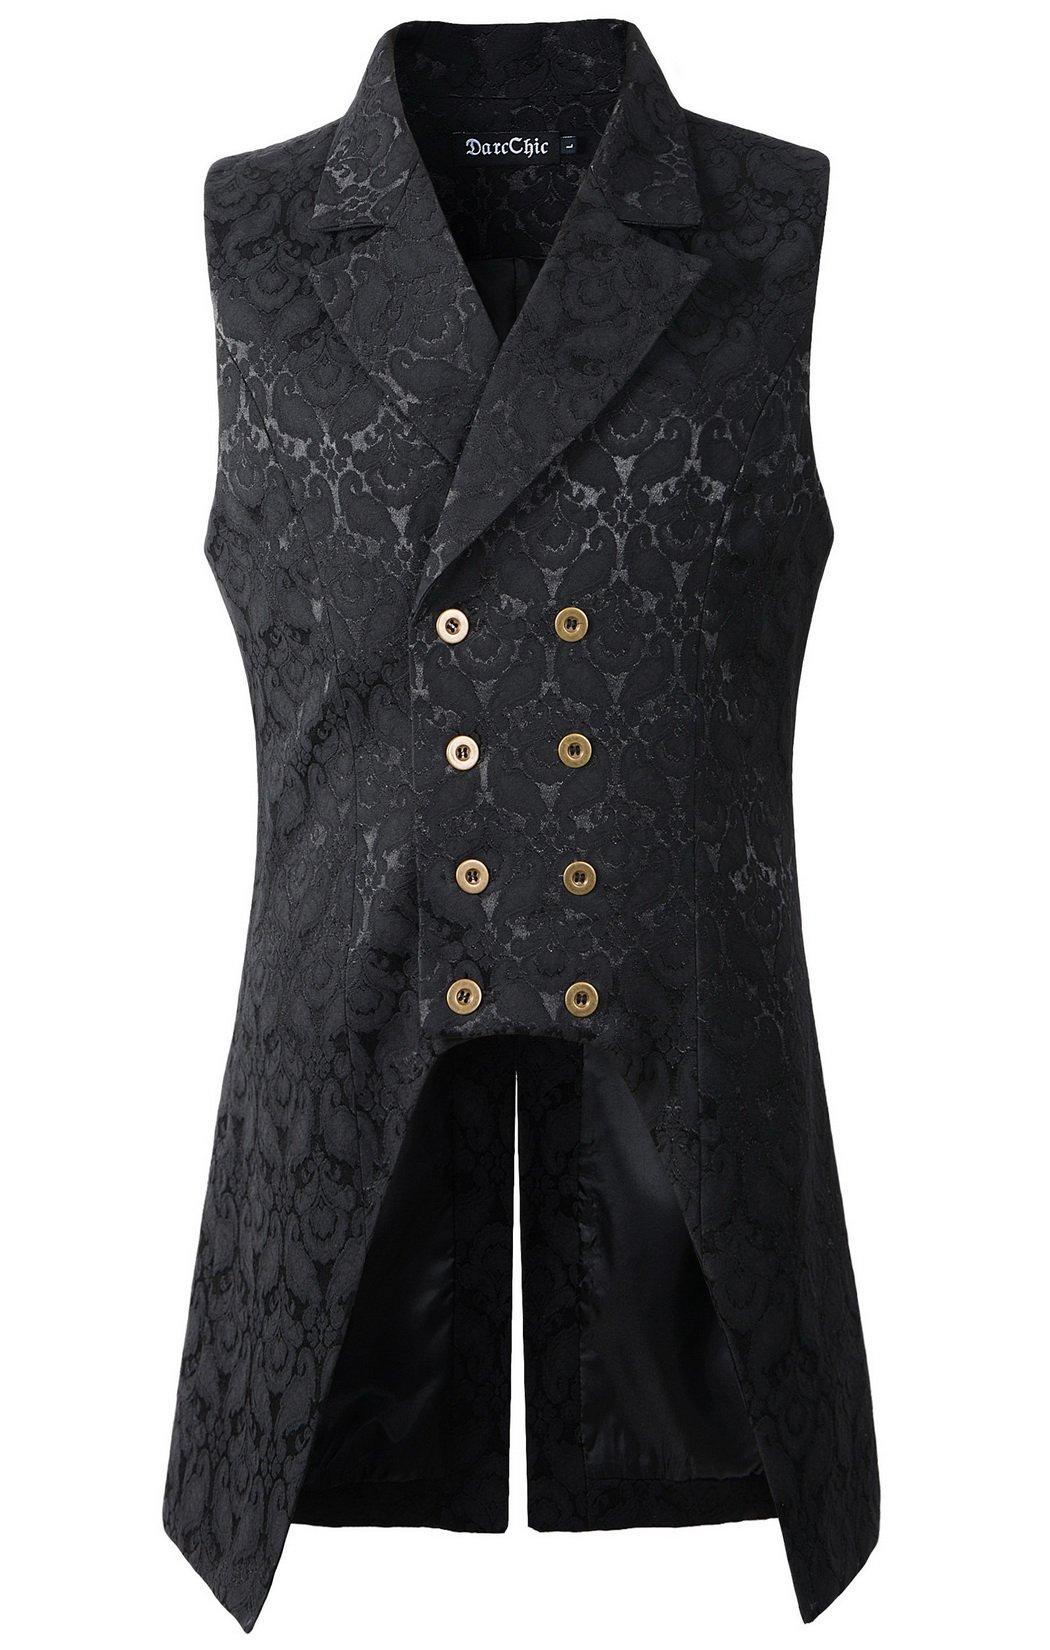 DarcChic Mens Double Breasted Vest Waistcoat VTG Brocade Gothic Steampunk (L, Black)